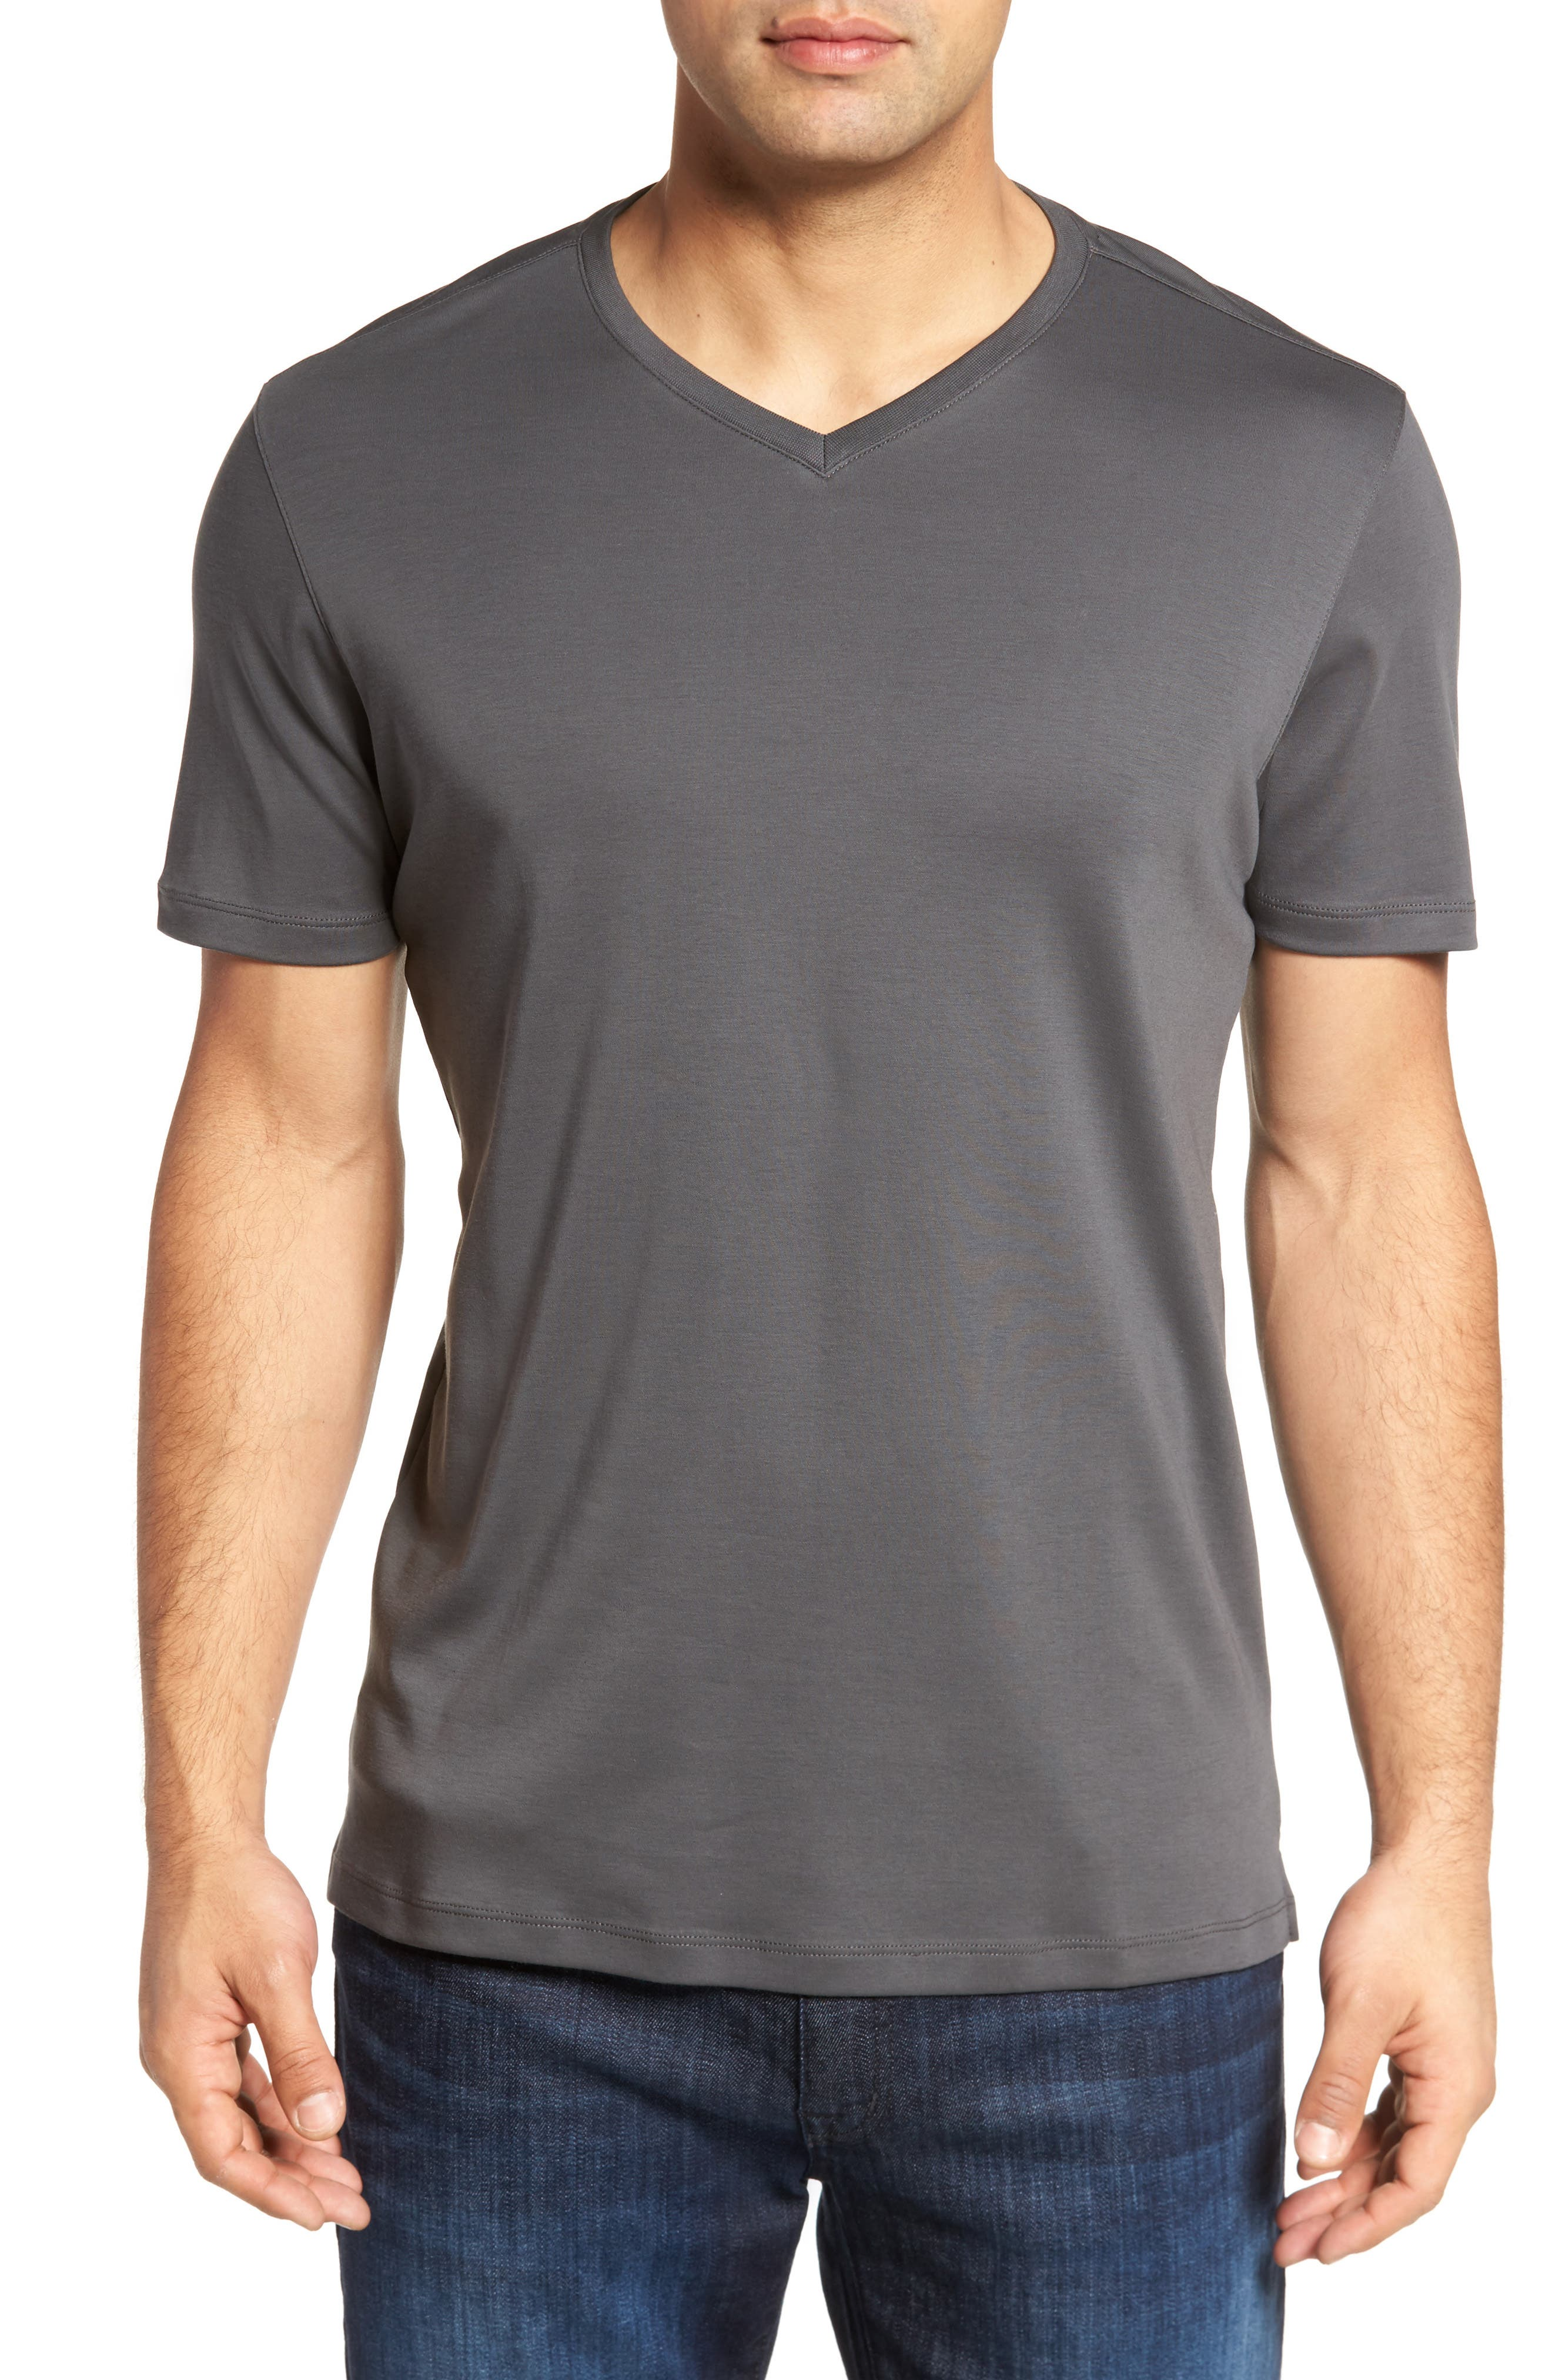 ROBERT BARAKETT Georgia Regular Fit V-Neck T-Shirt, Main, color, IRON